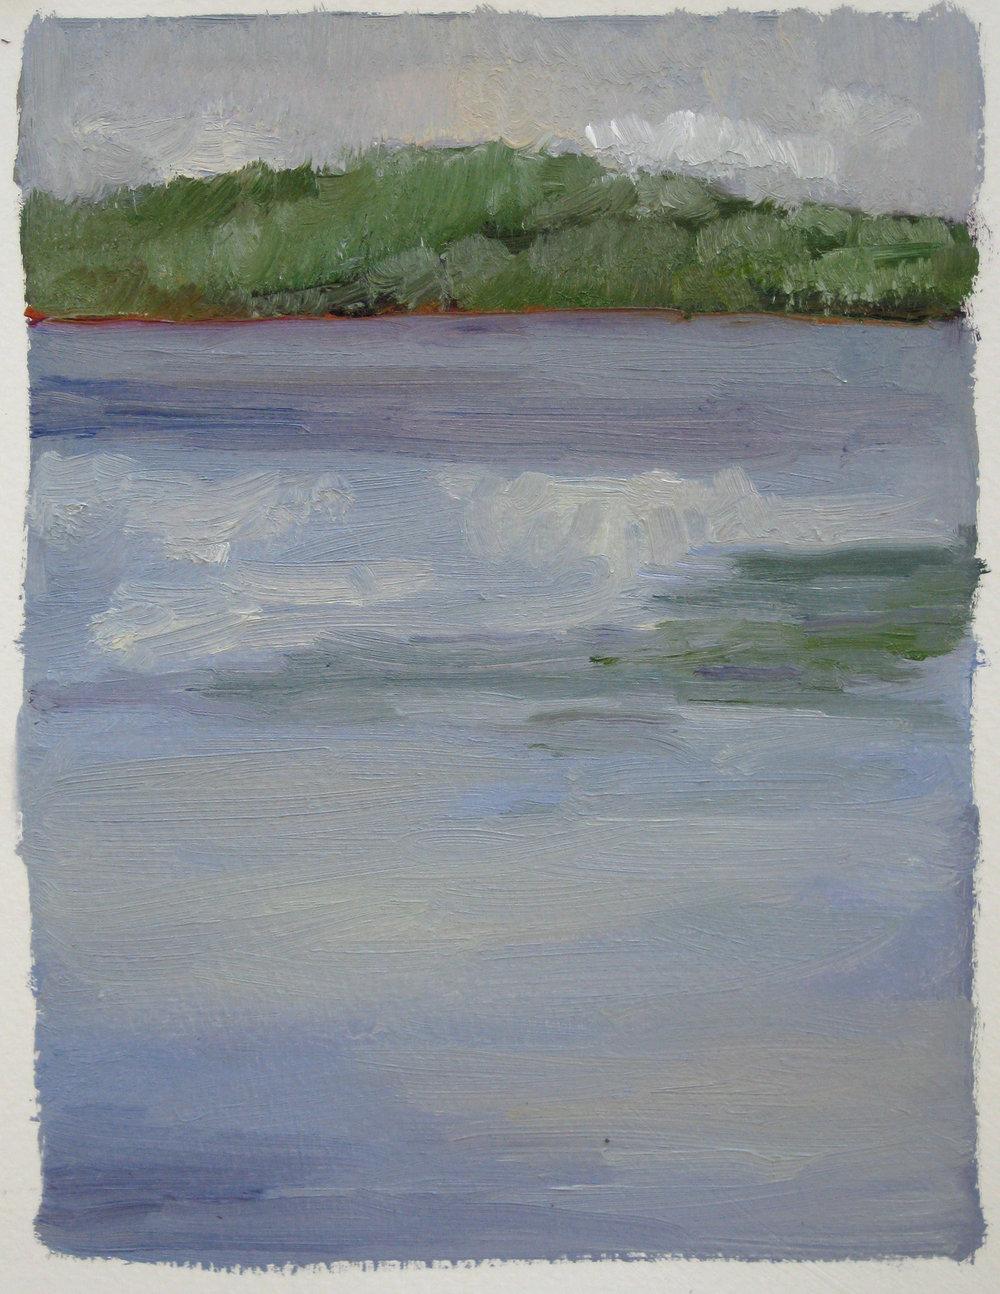 20110929-Potomac-River-Series-25.jpg